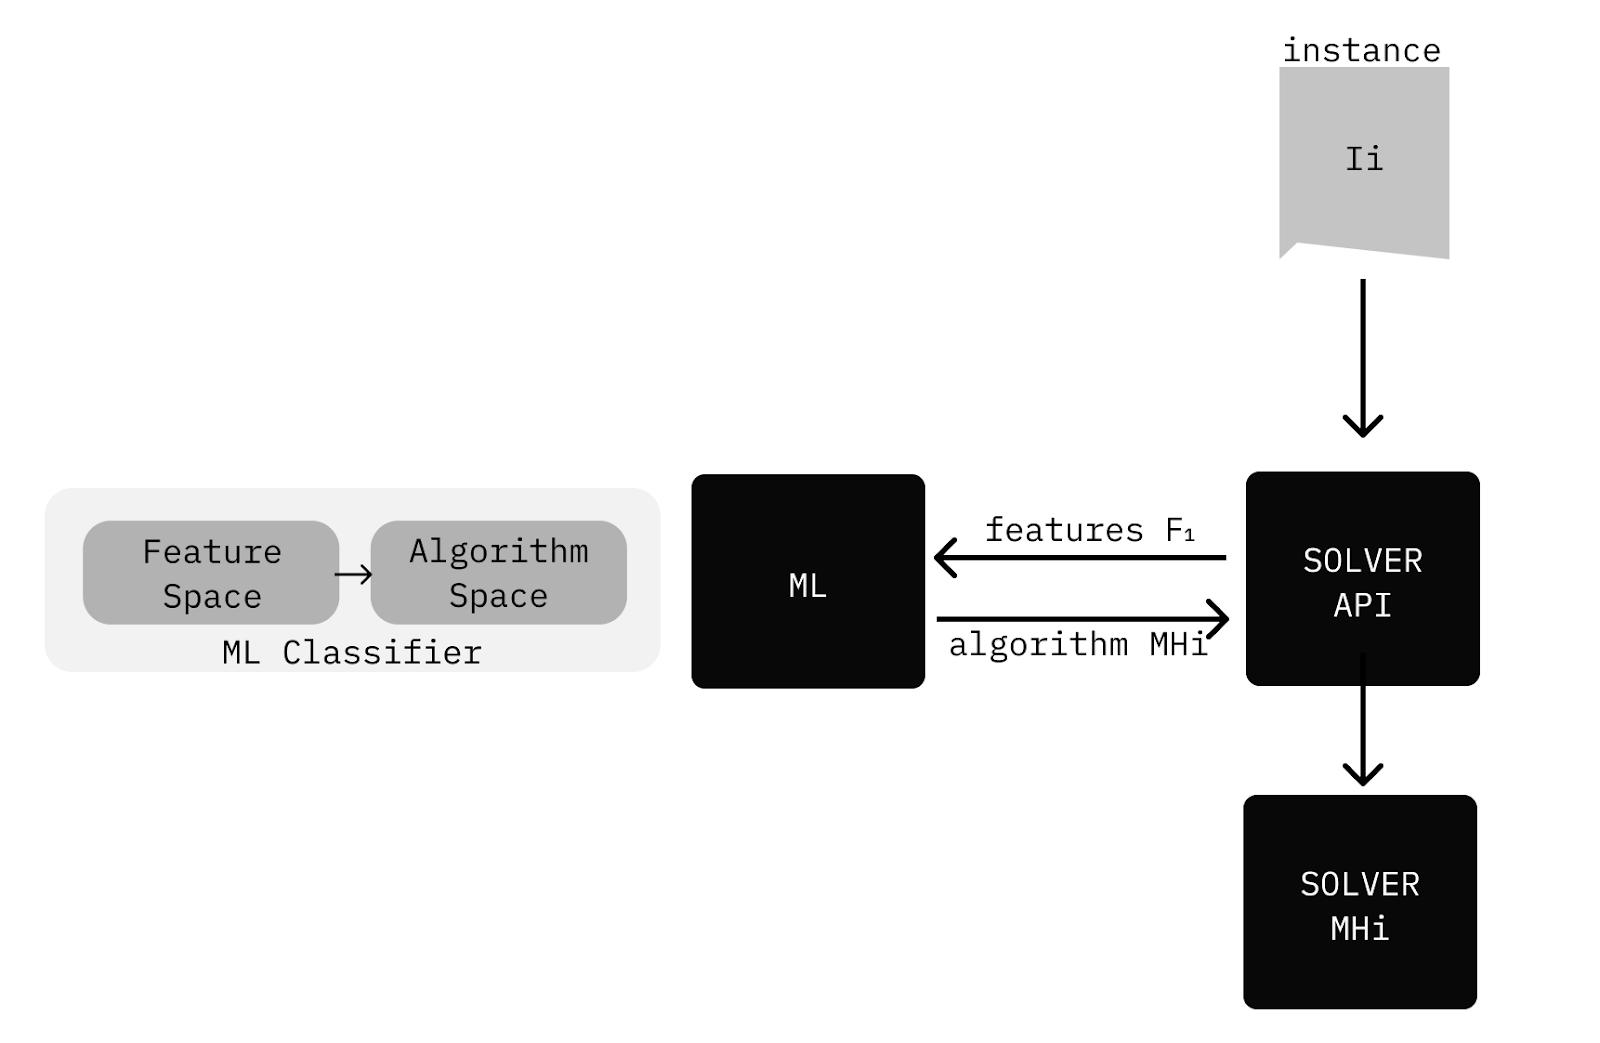 Figure 3: Solver API using ML classifier to suggest ideal algorithm online.